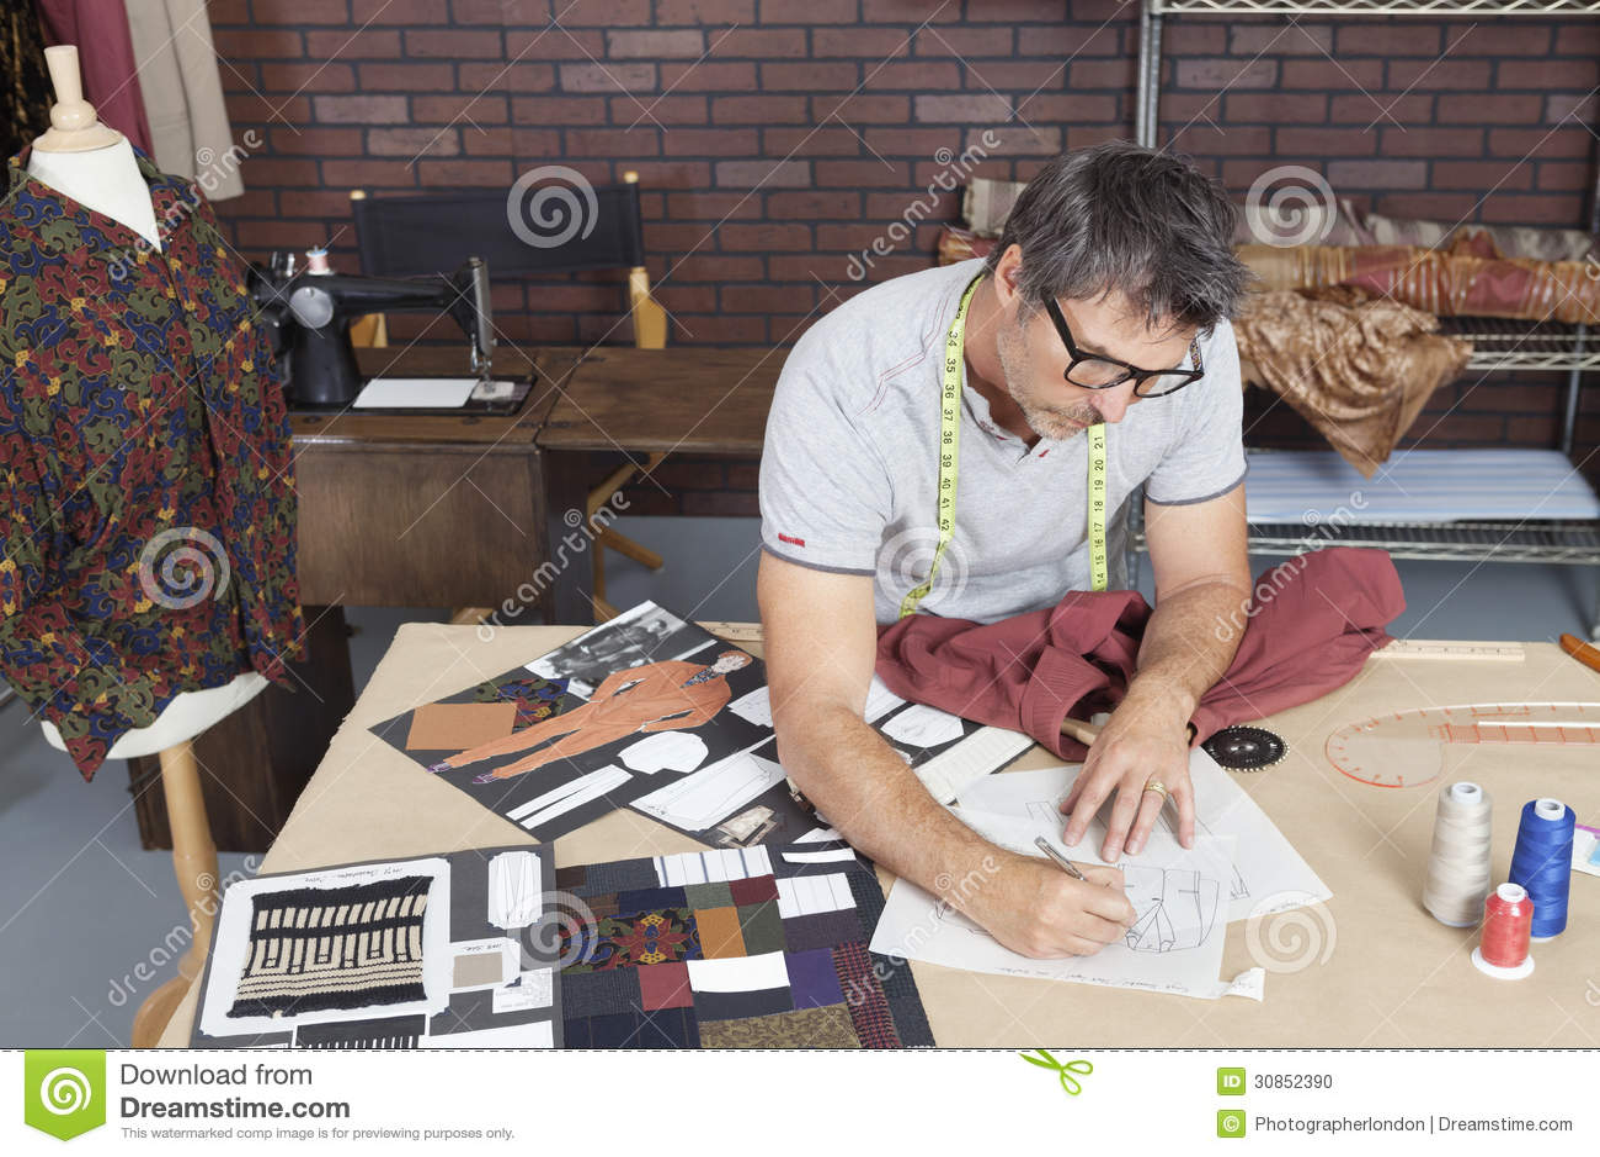 Mature Male Fashion Designer Working On Sketch In Design Studio Stock Photo Image 30852390